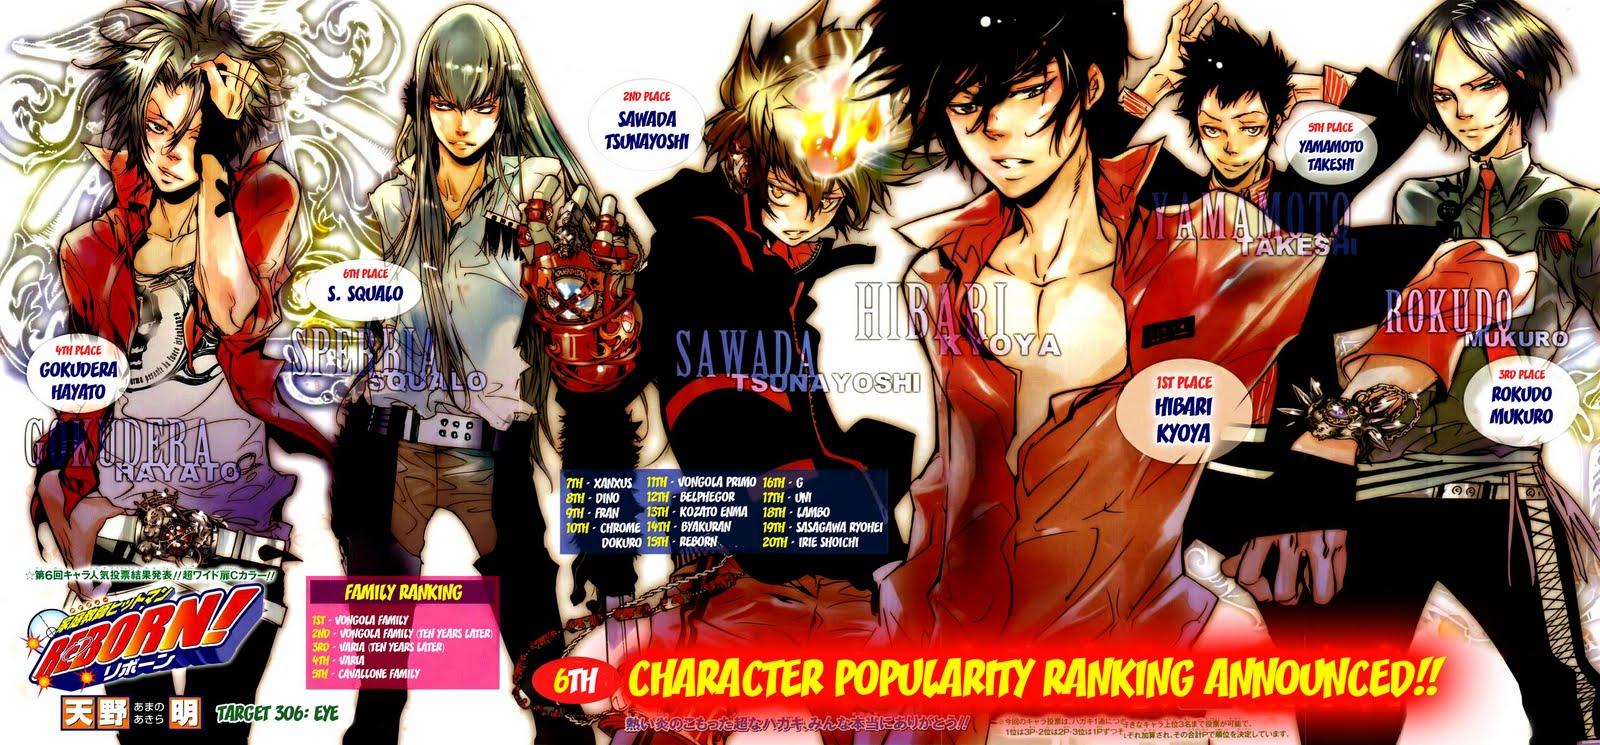 Anime Characters Popularity Poll : Gfw s anime manga